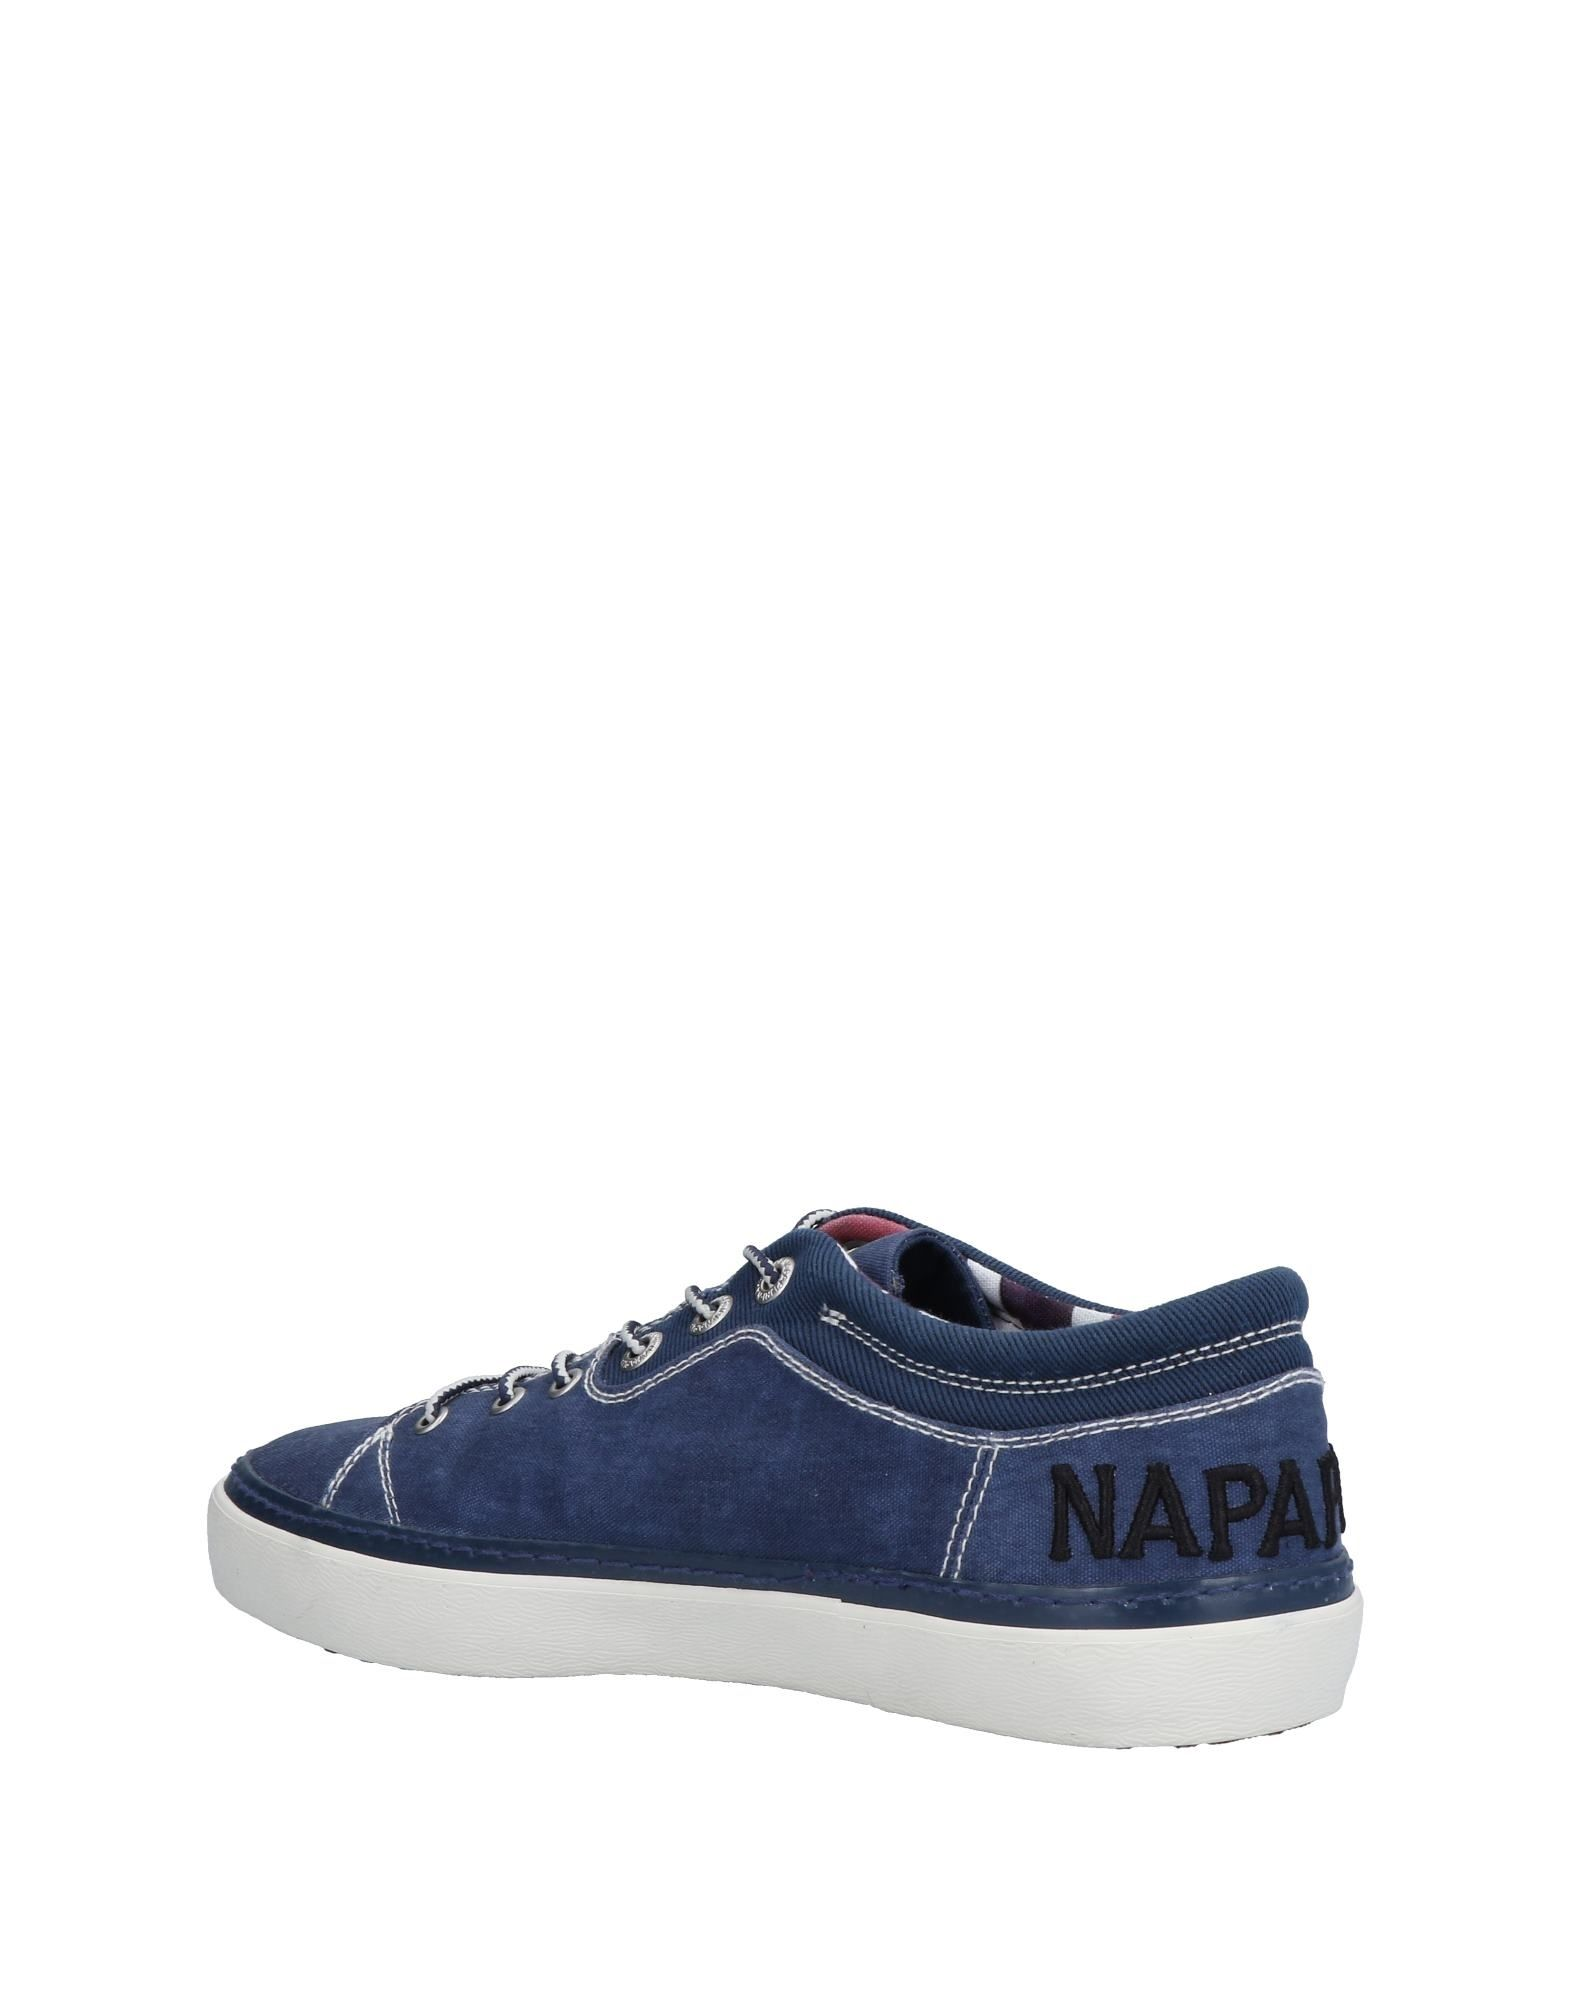 Napapijri Sneakers Sneakers Sneakers - Men Napapijri Sneakers online on  Australia - 11519770FW d75cc6